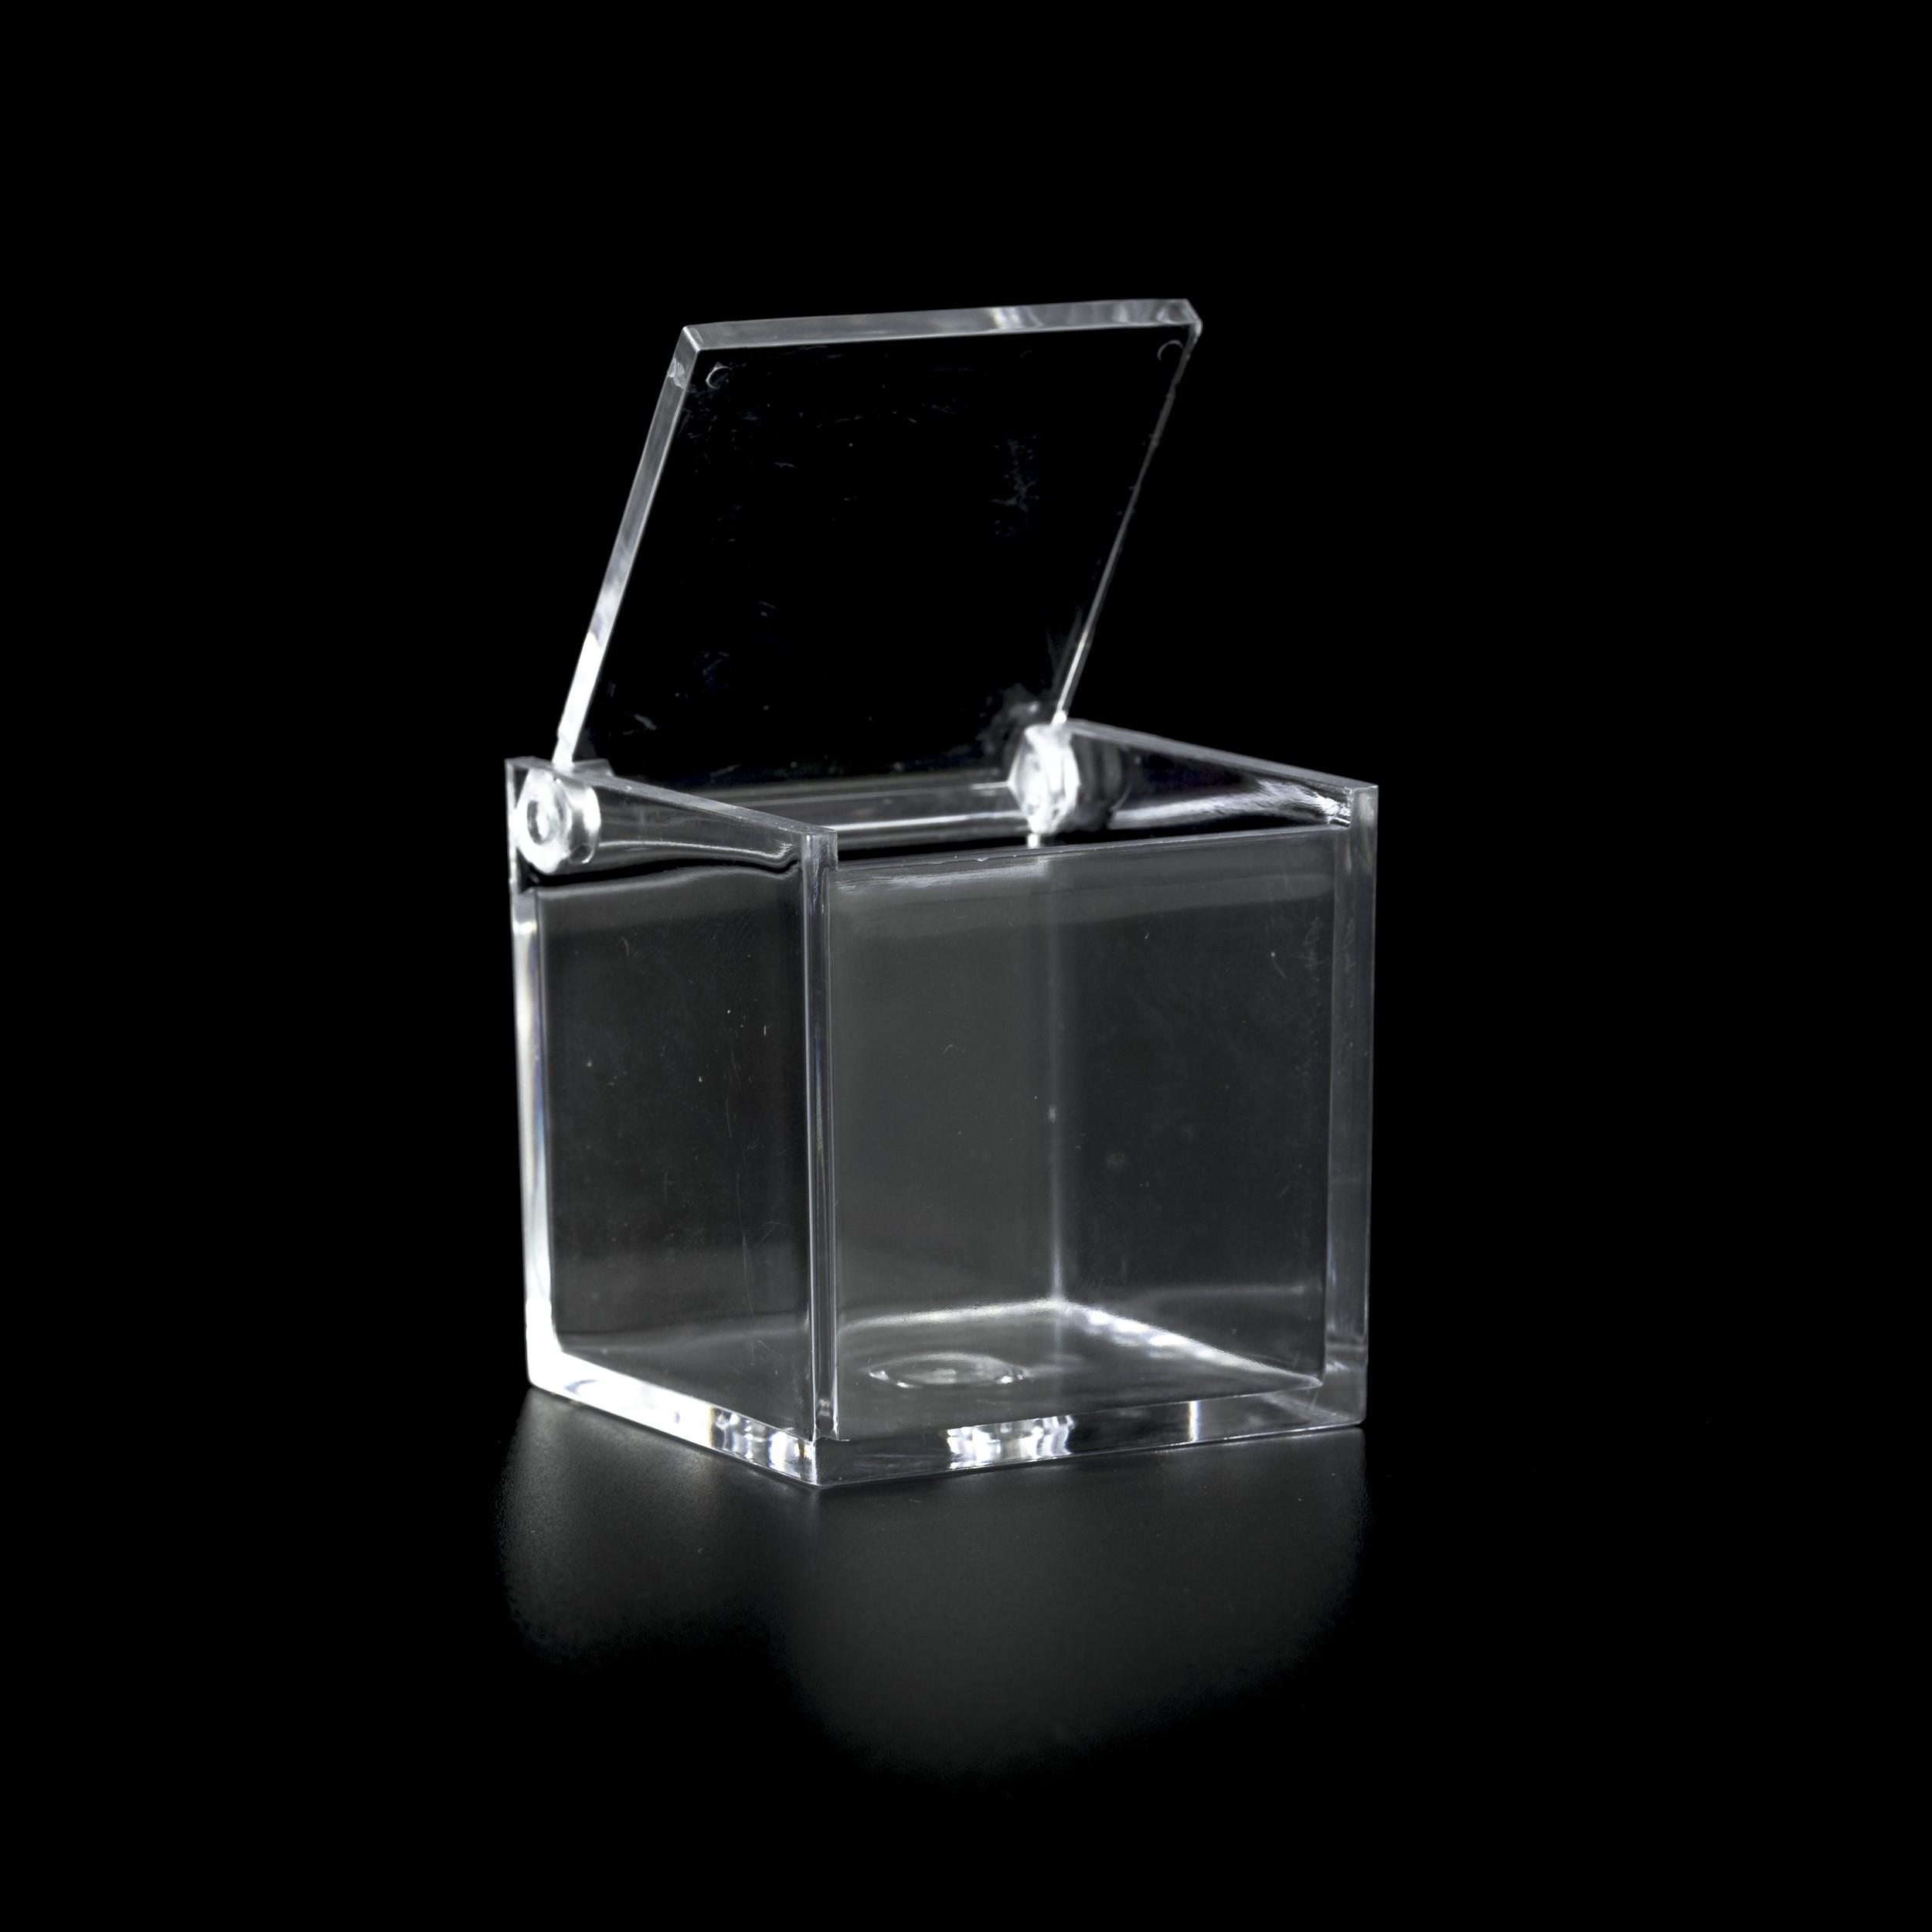 SCATOLA PLEXIGLASS MIS. CM.5X5X5 - Plexiglass - Portaconfetti